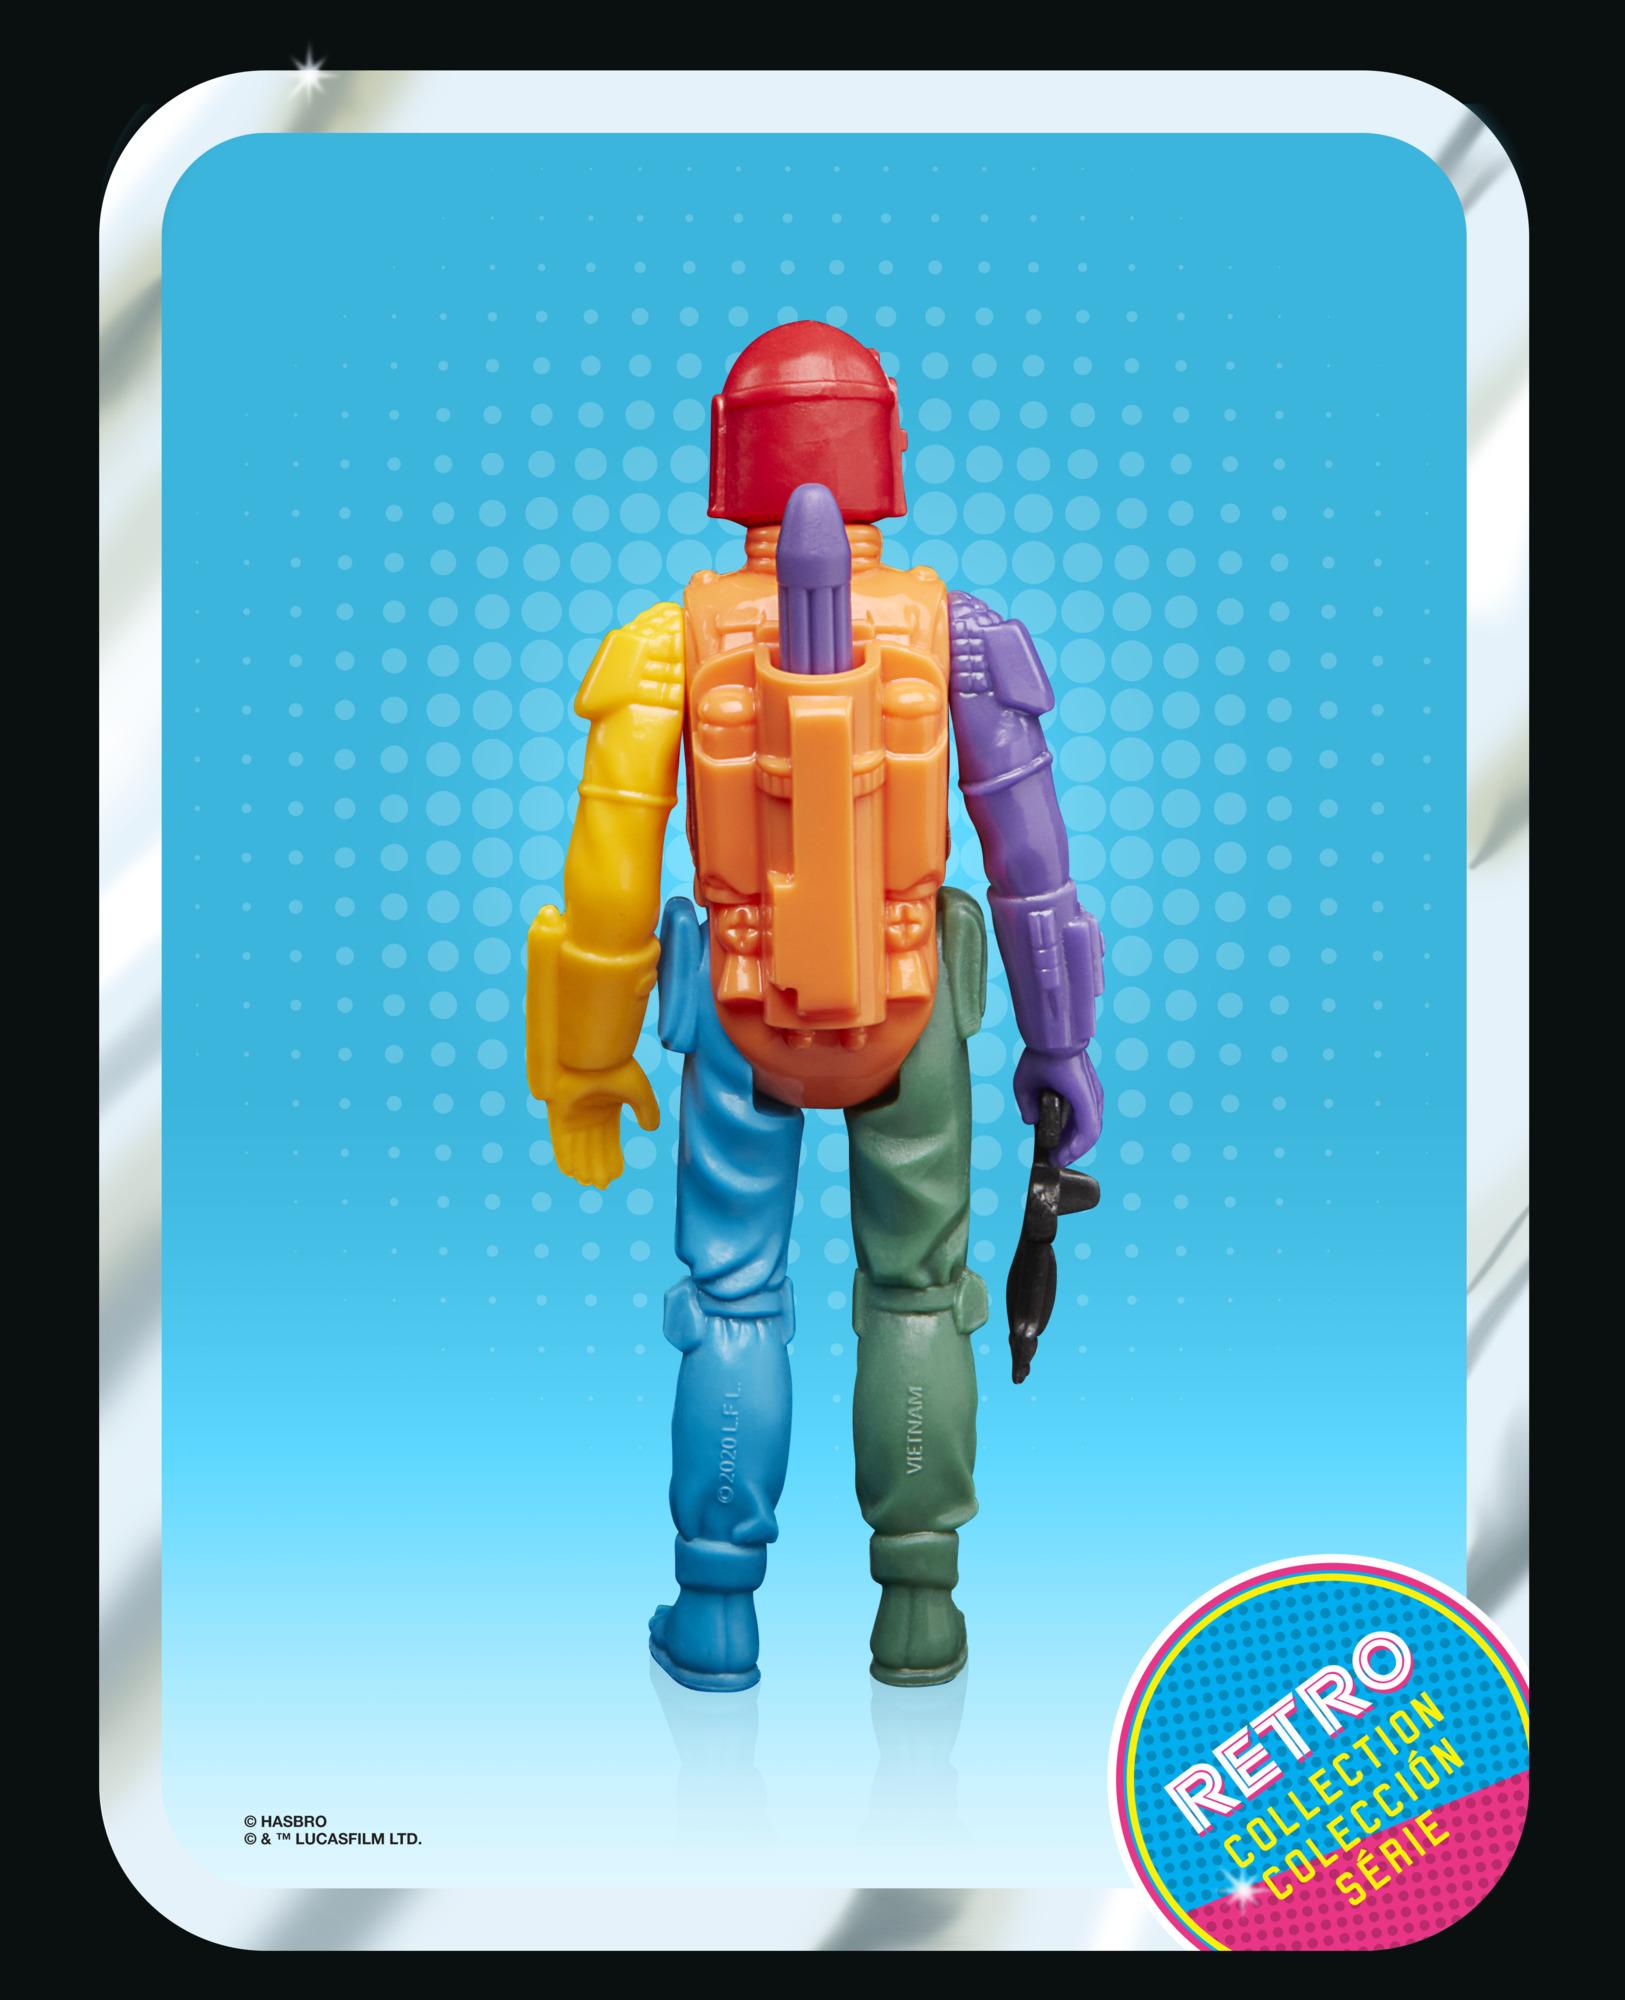 Star Wars Retro Collection Boba Fett Prototype Edition F27135L00 5010993867028